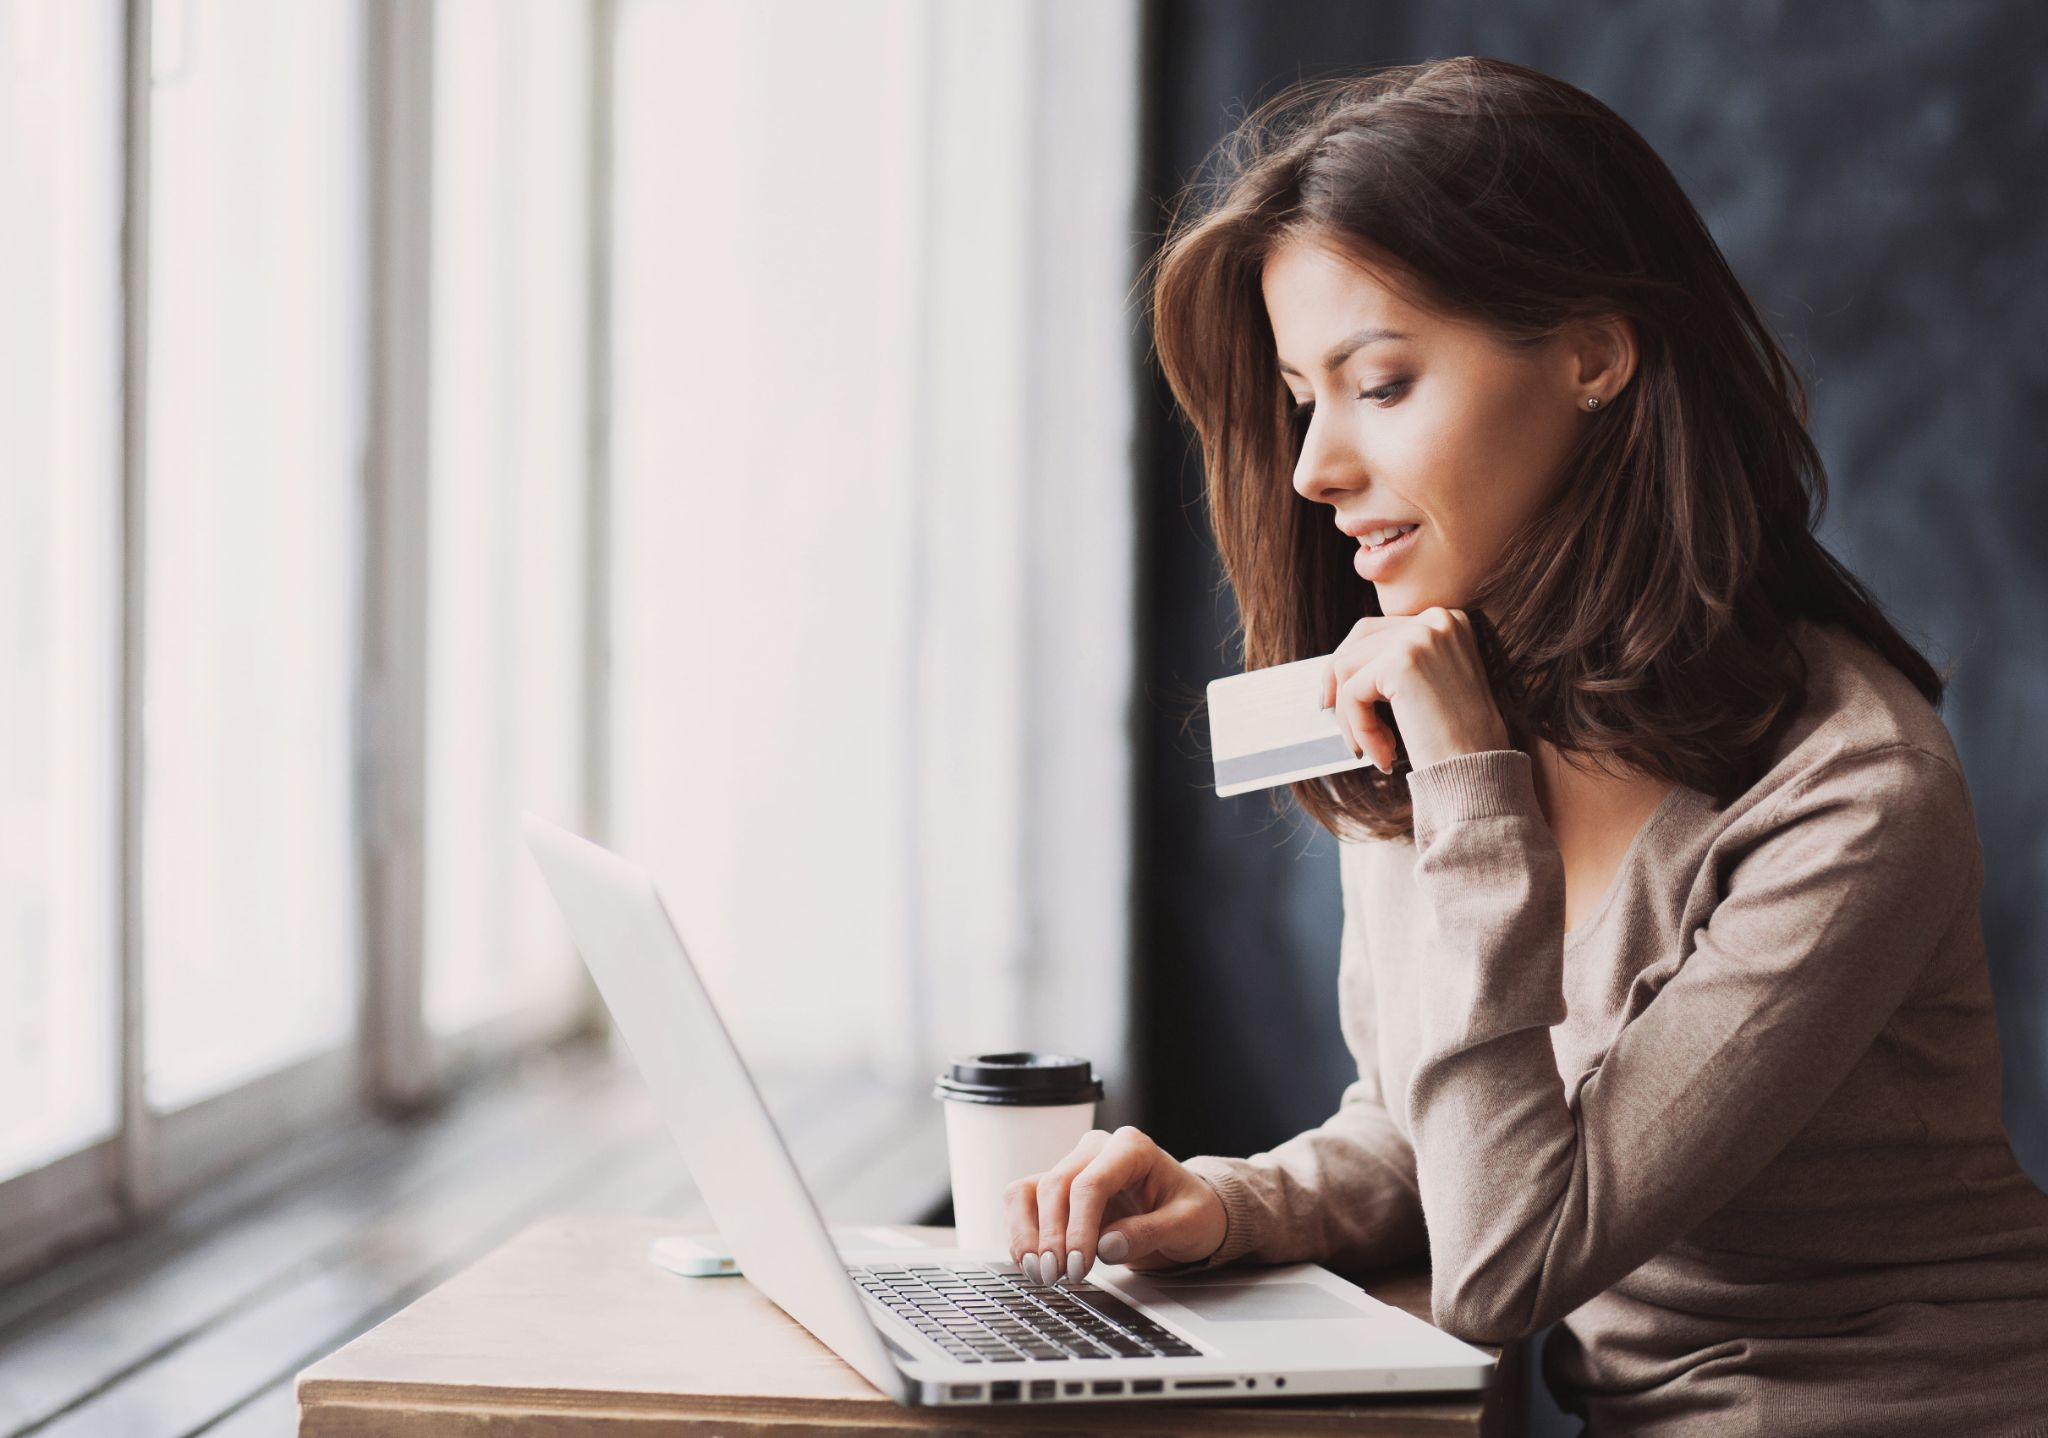 Loja de roupa feminina on-line ou fisica